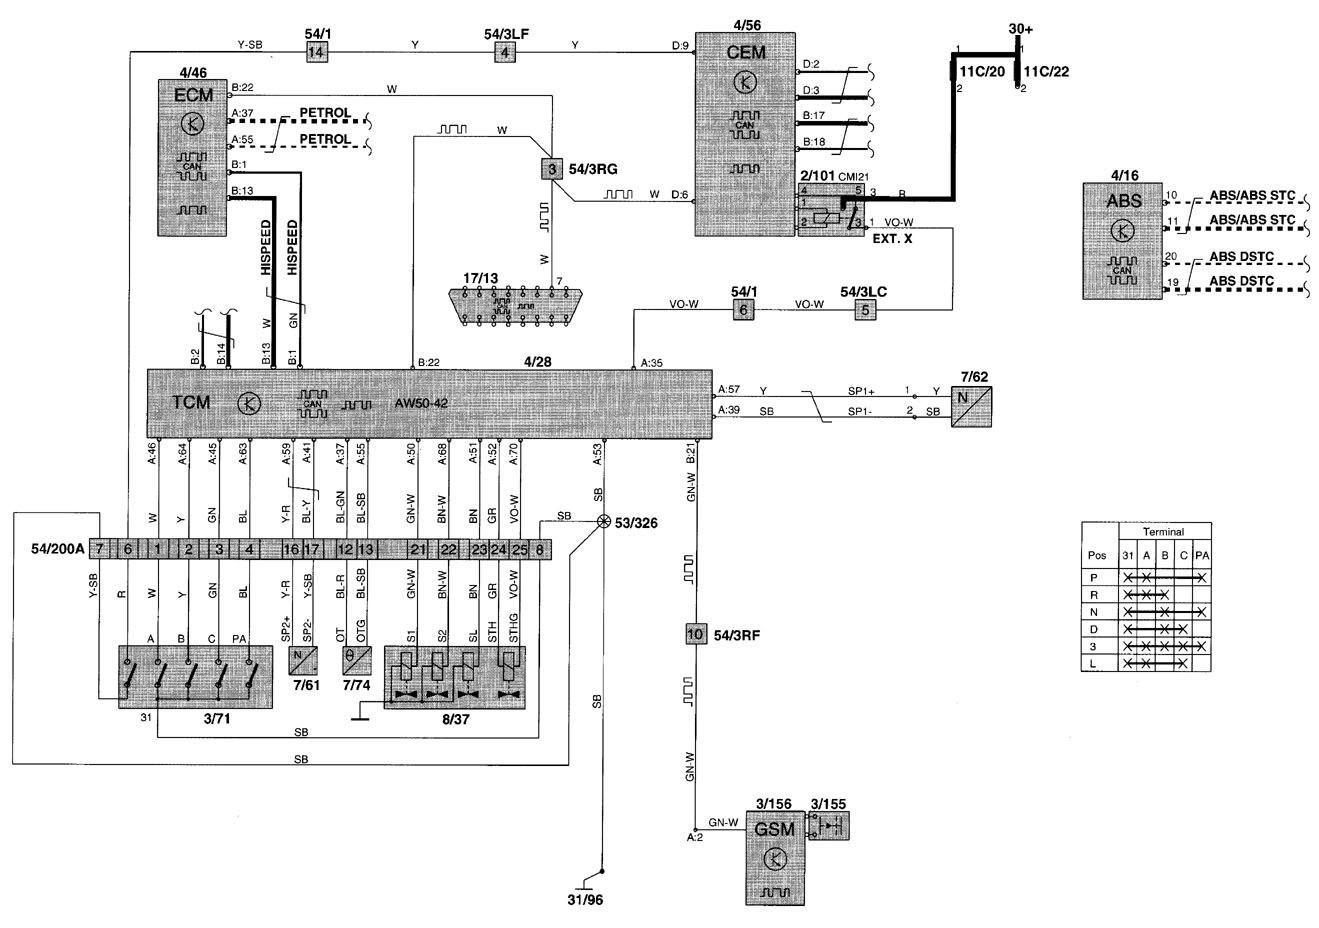 volvo v70 2000 wiring diagrams transmission controls v70 transmission wiring diagram volvo v70 headlight wiring diagram #2